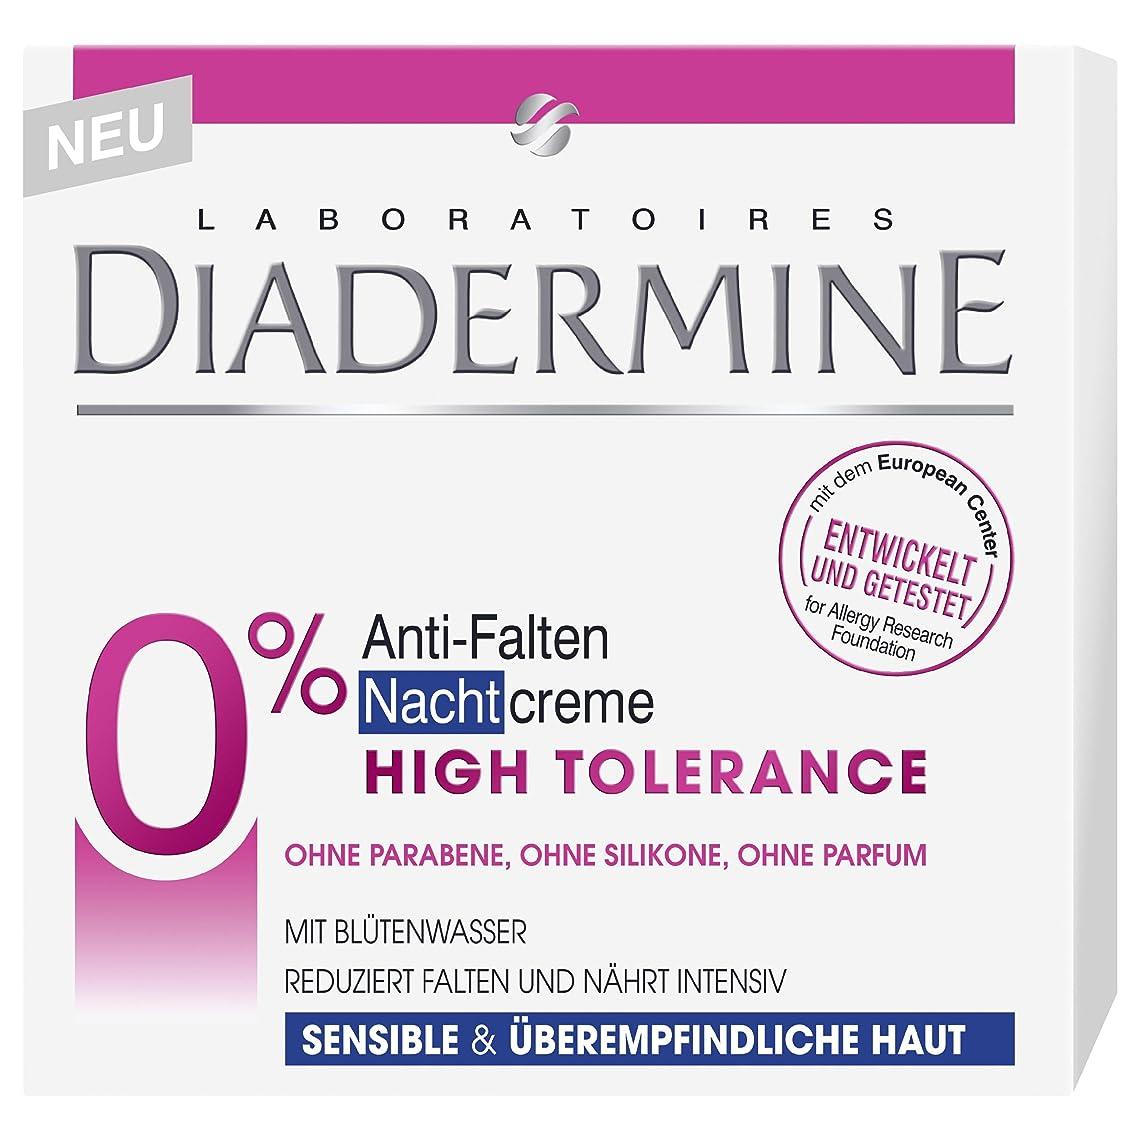 骨劣る苦痛Diadermine Anti-Falten Nachtcreme High Tolerence 50ml/Reduziert Falten und n?hrt intensiv/für sensible und überempfindliche Haut